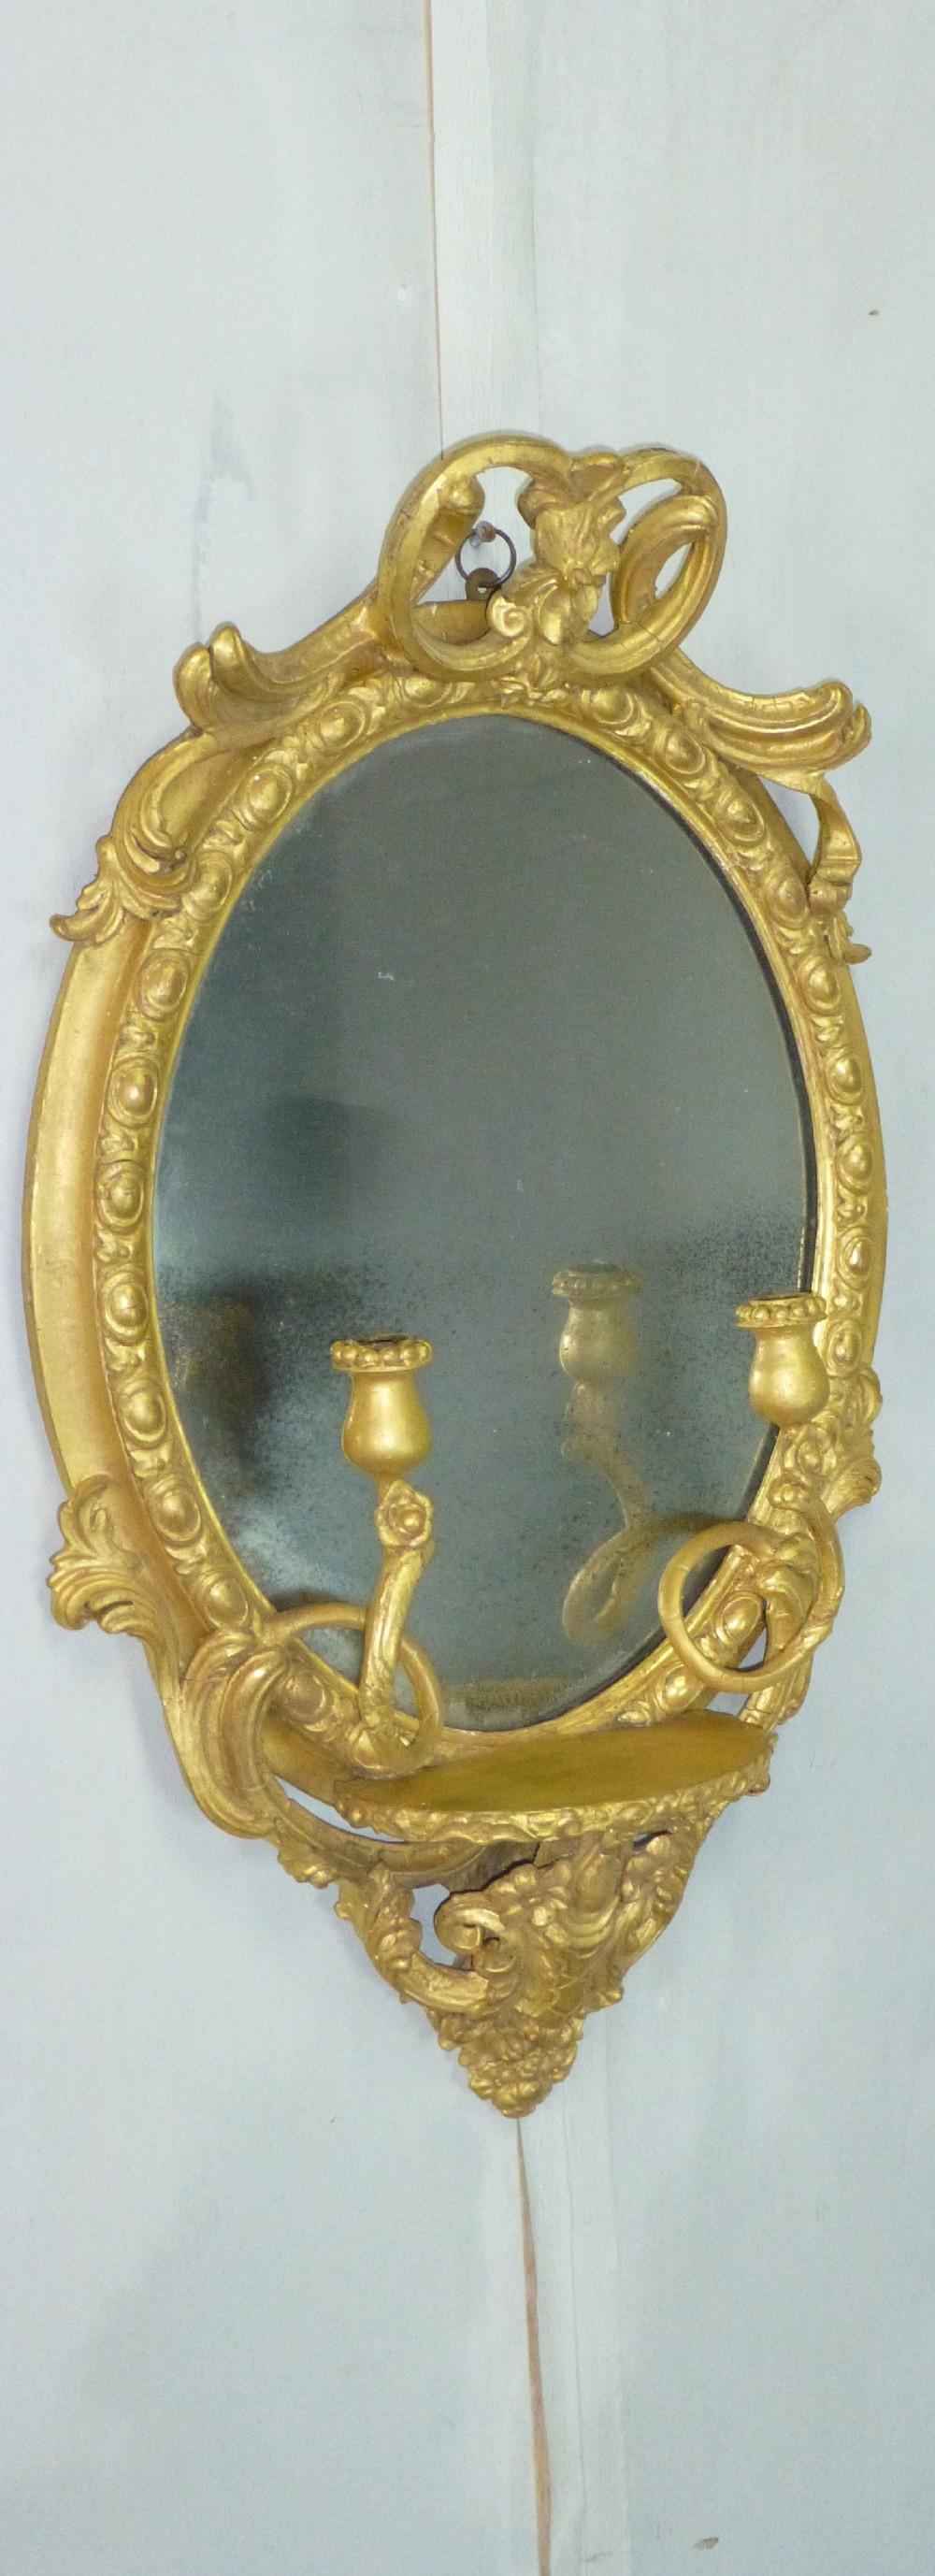 antique 19th century english gilt girandole oval wall looking glass mirror c1860